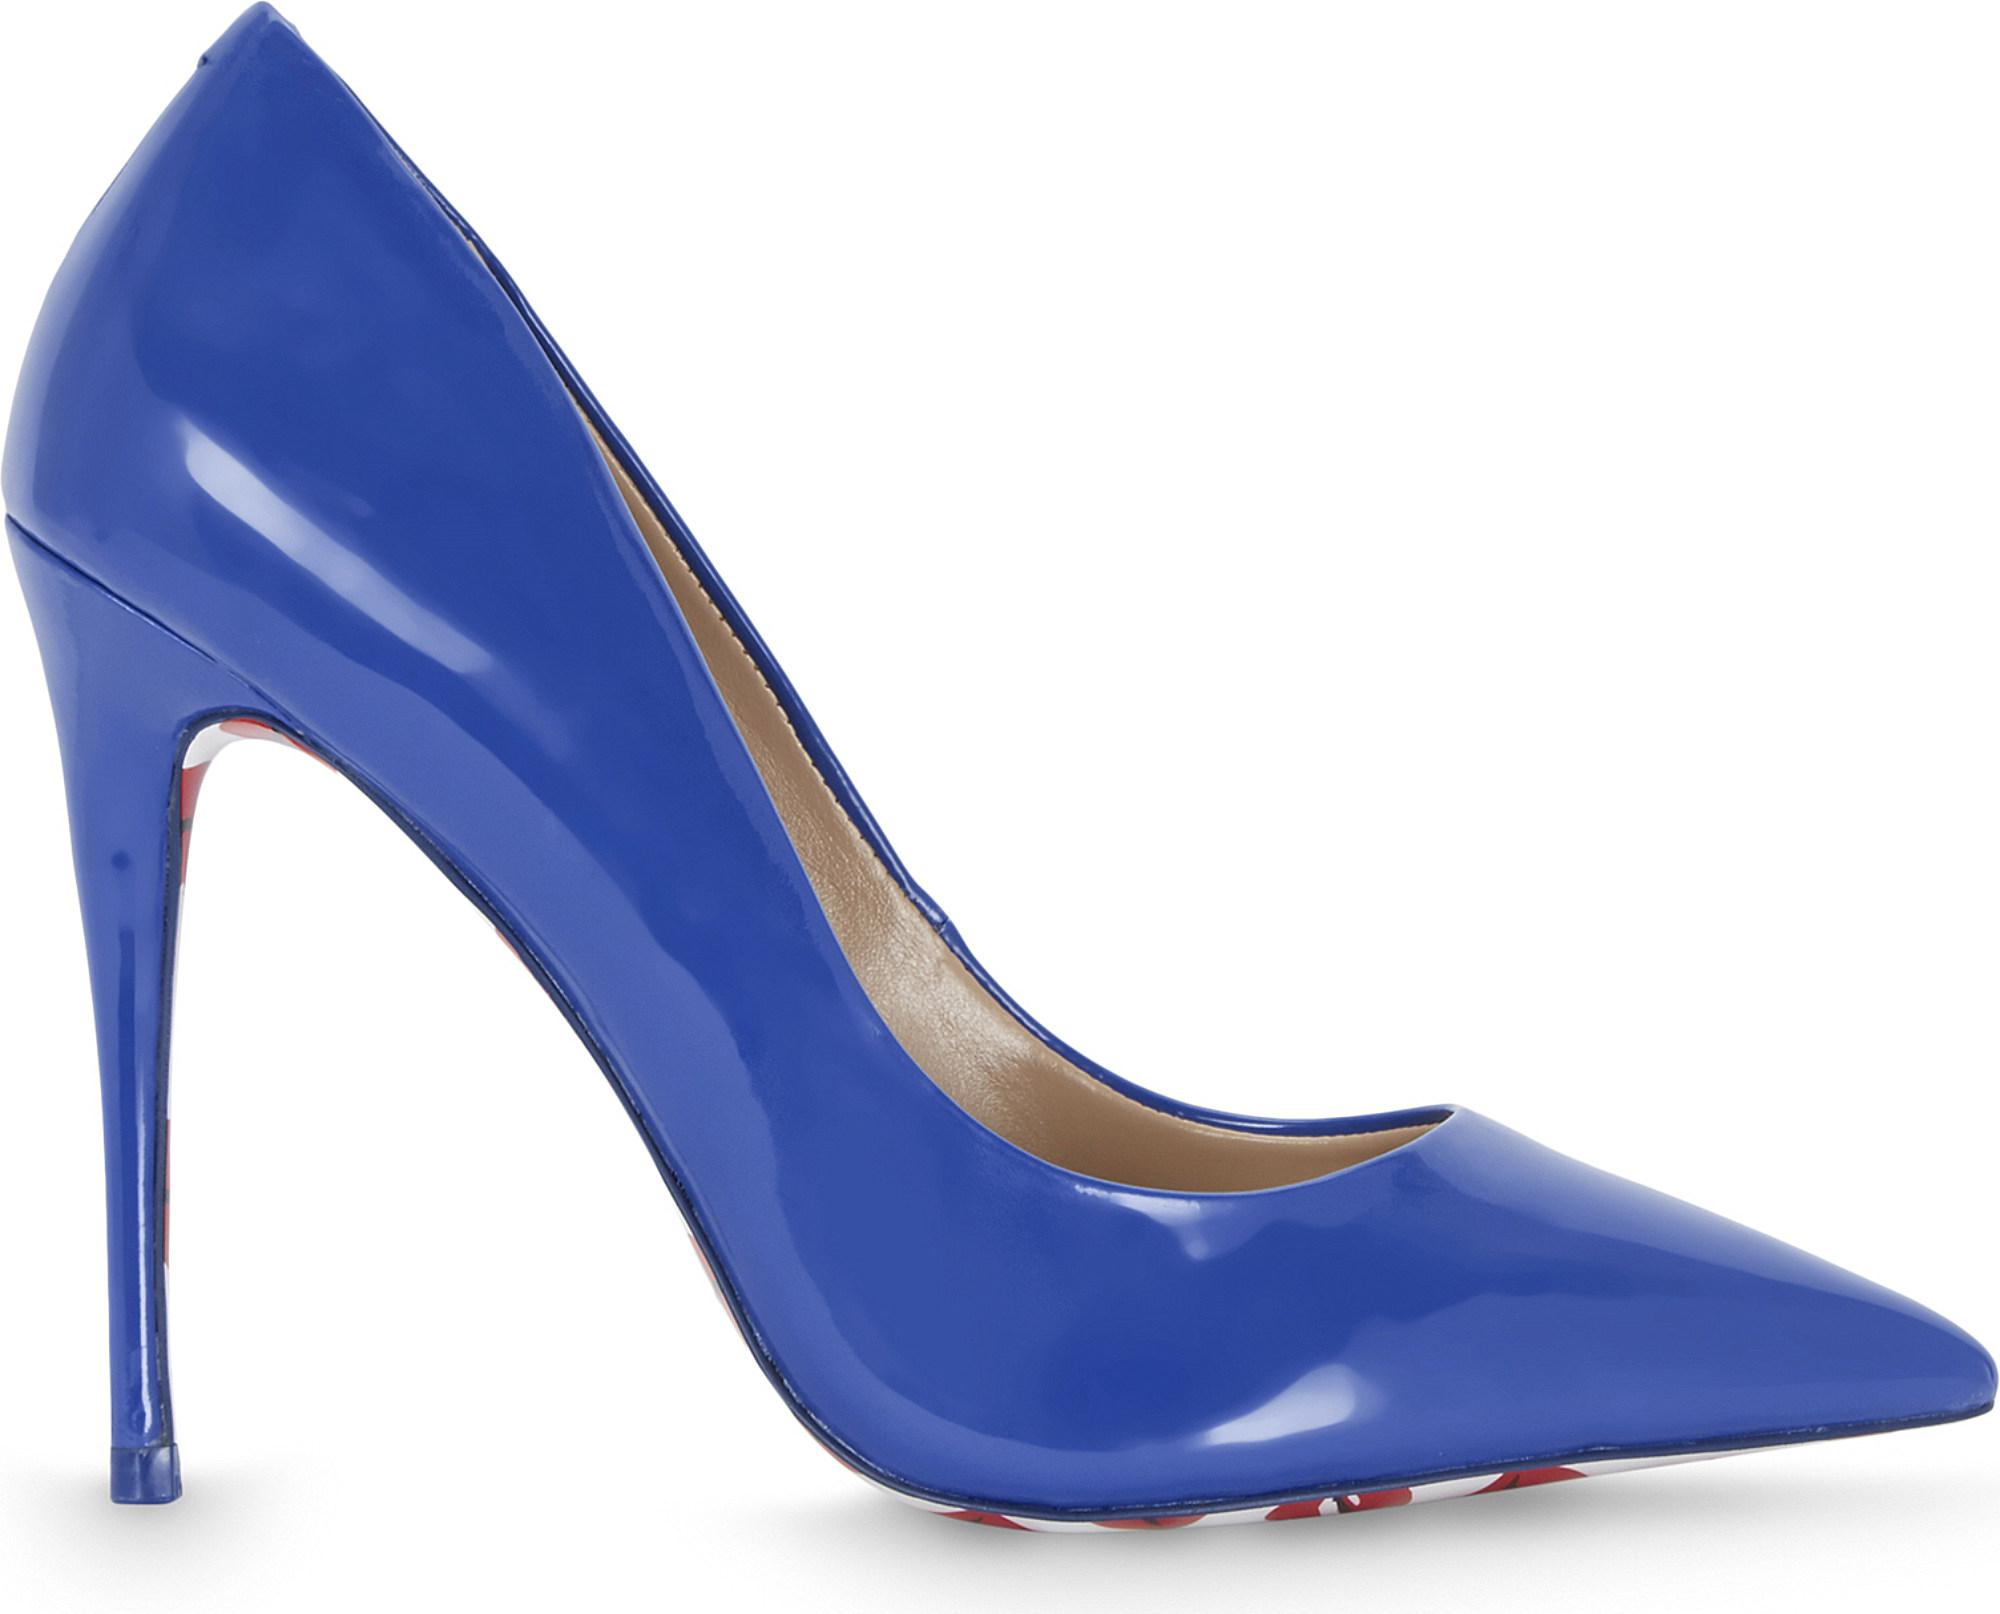 cf12db2ff7c3 Lyst - ALDO Stessy K Patent Courts in Blue